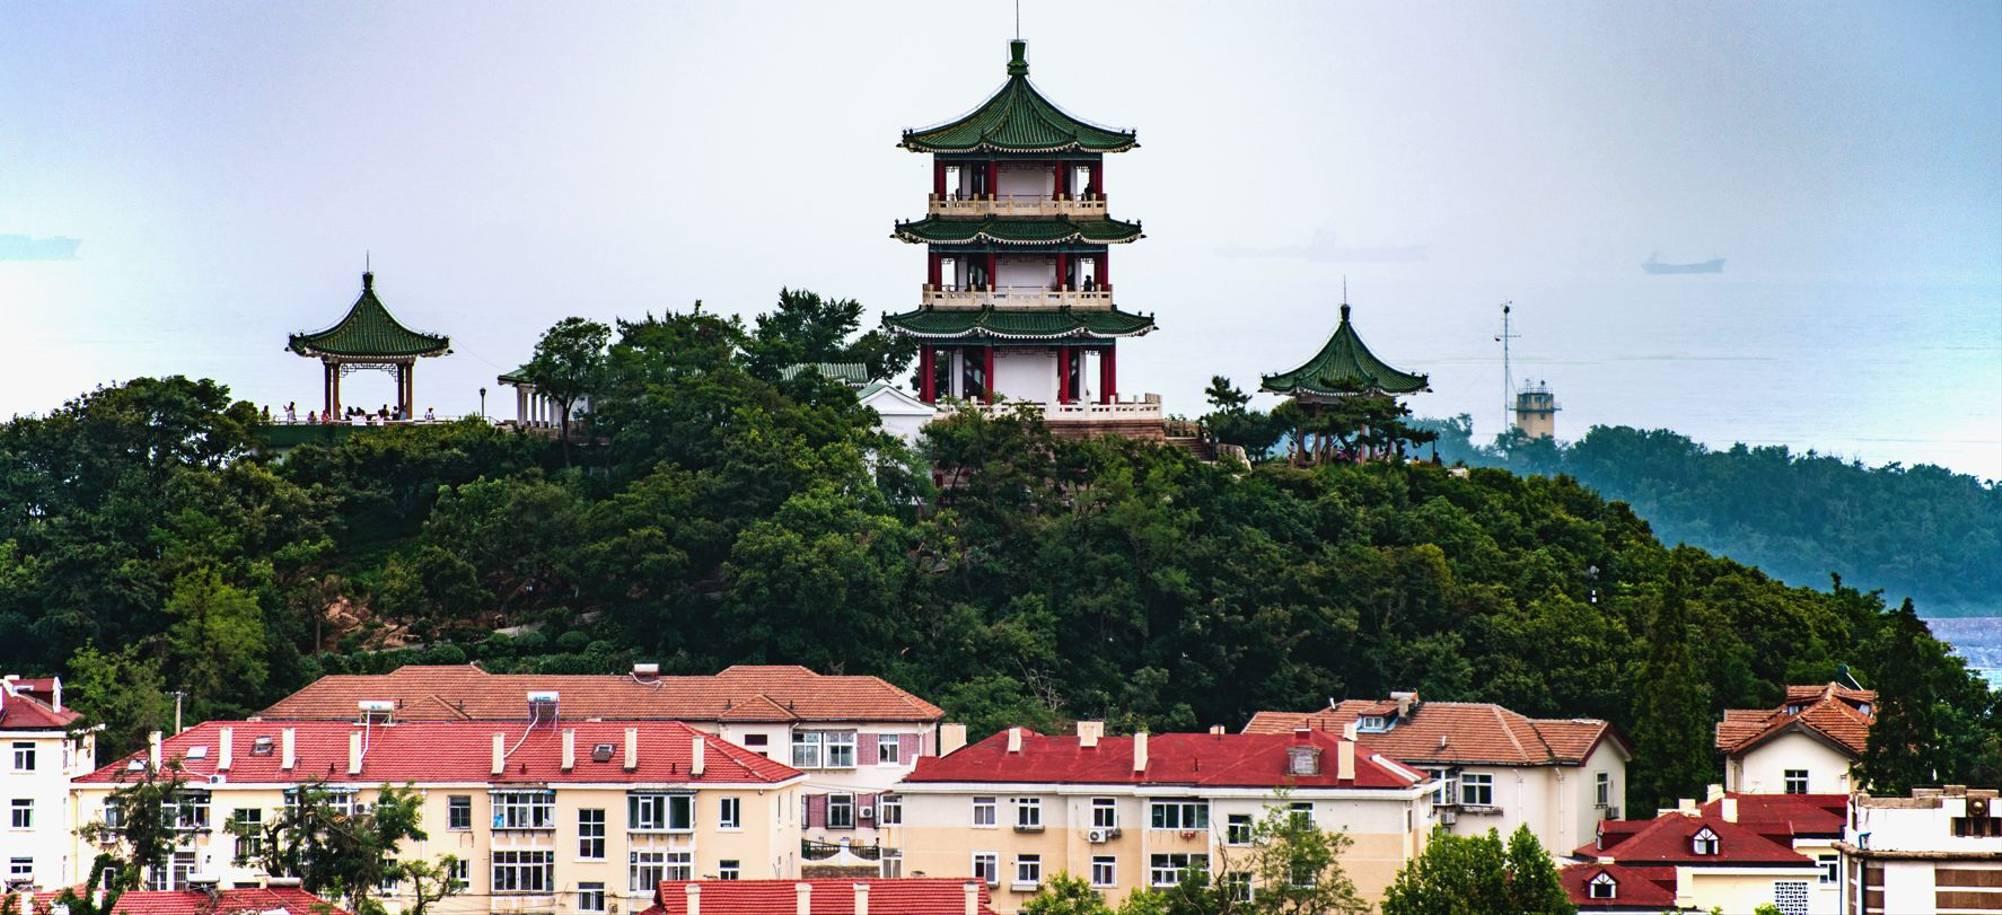 Qingdao   City Architecture   Itinerary Desktop